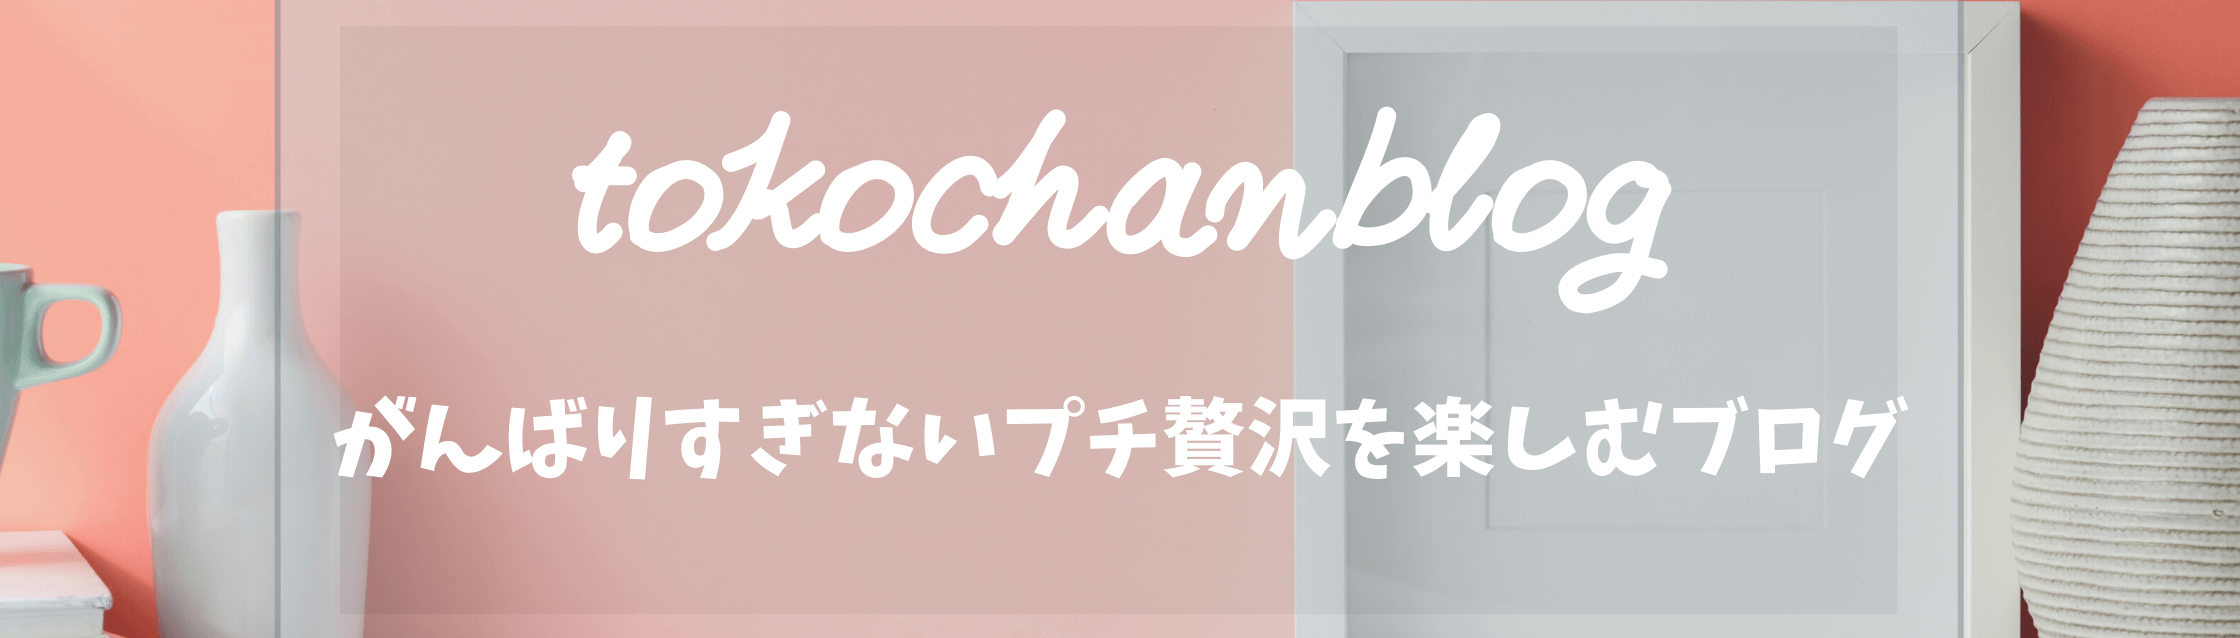 tokochanblog